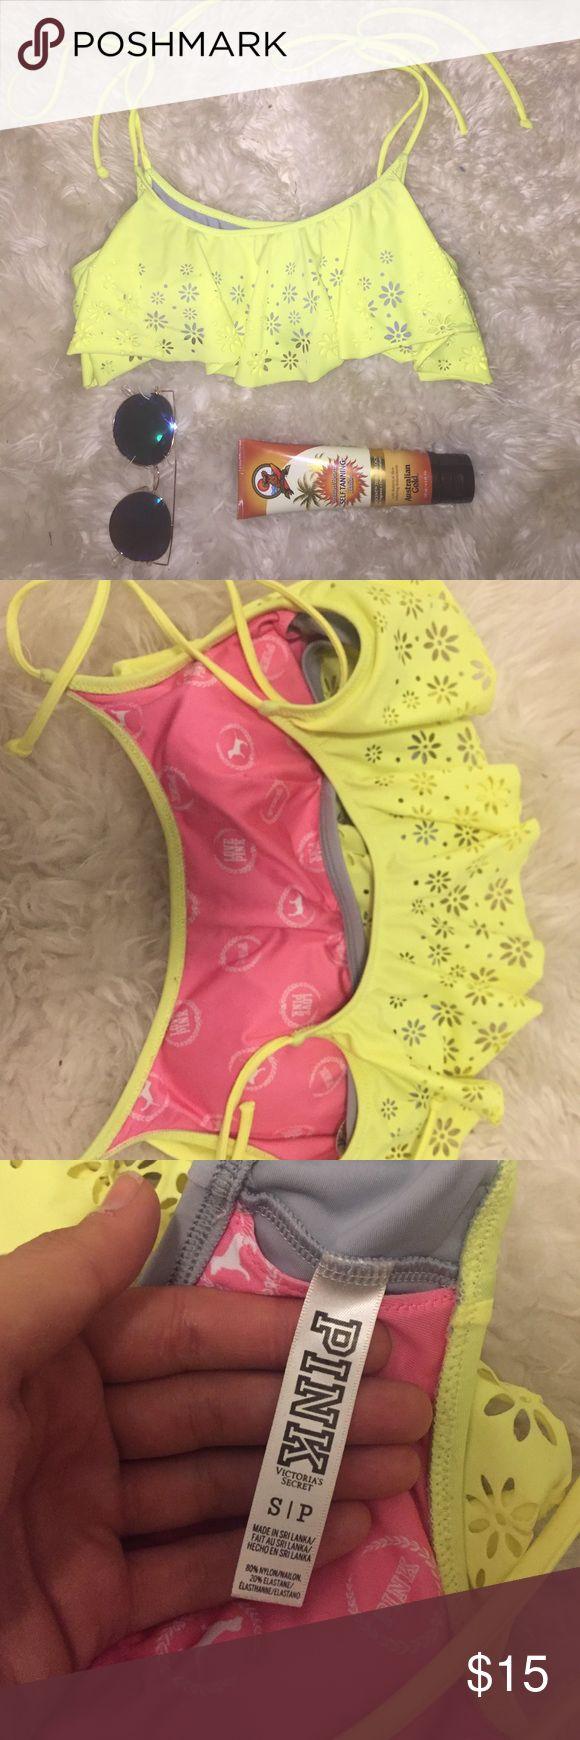 Victoria secret Pink bikini top bathing suit Beautiful fluorescent yellow bikini top with tie string straps. Lined underneath with a yellow flap with beautiful flower cut outs. PINK Victoria's Secret Swim Bikinis